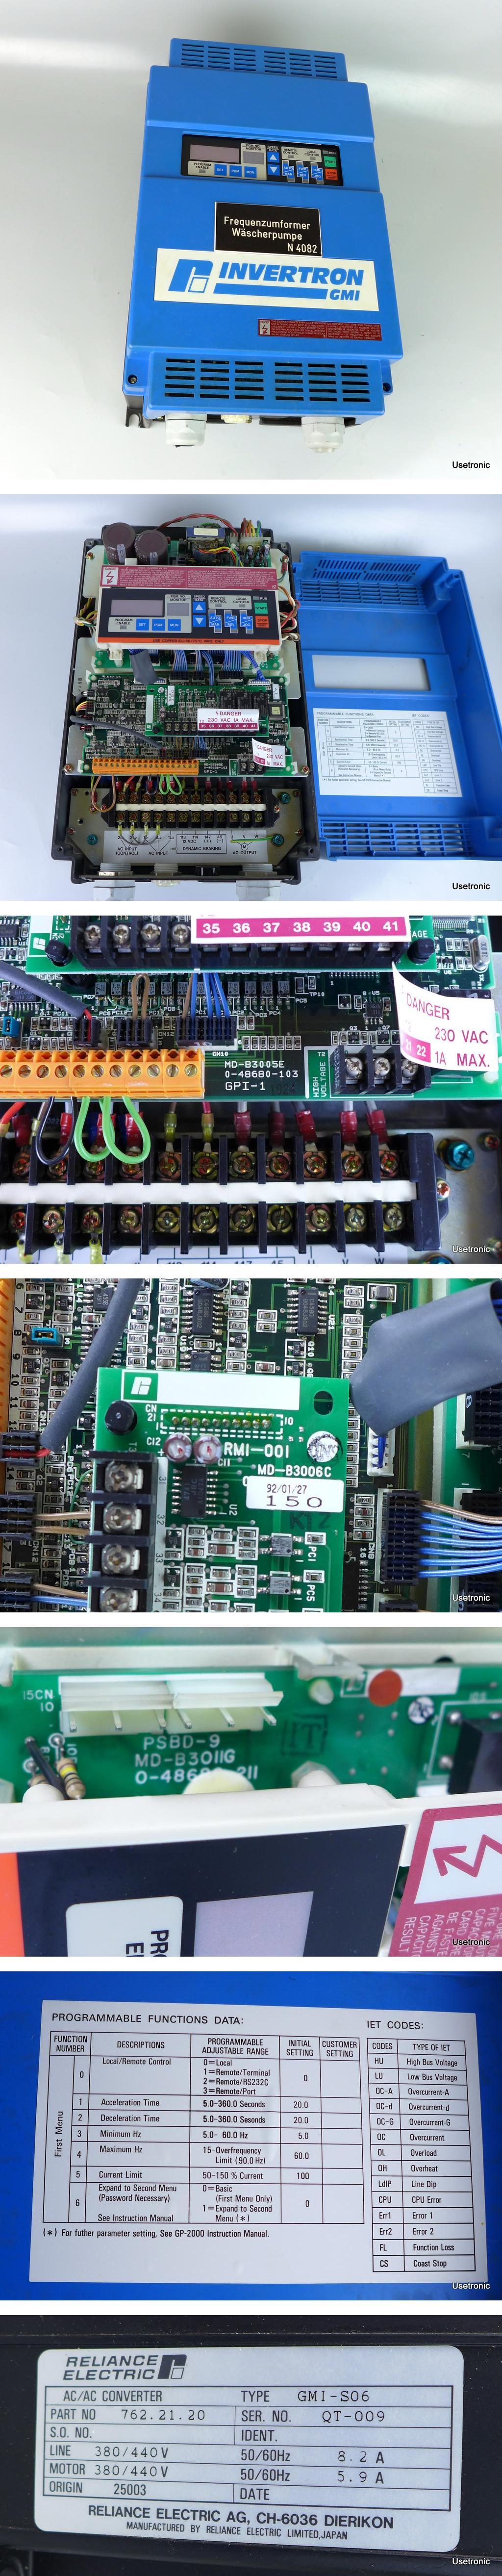 Reliance Electric GMI-S06